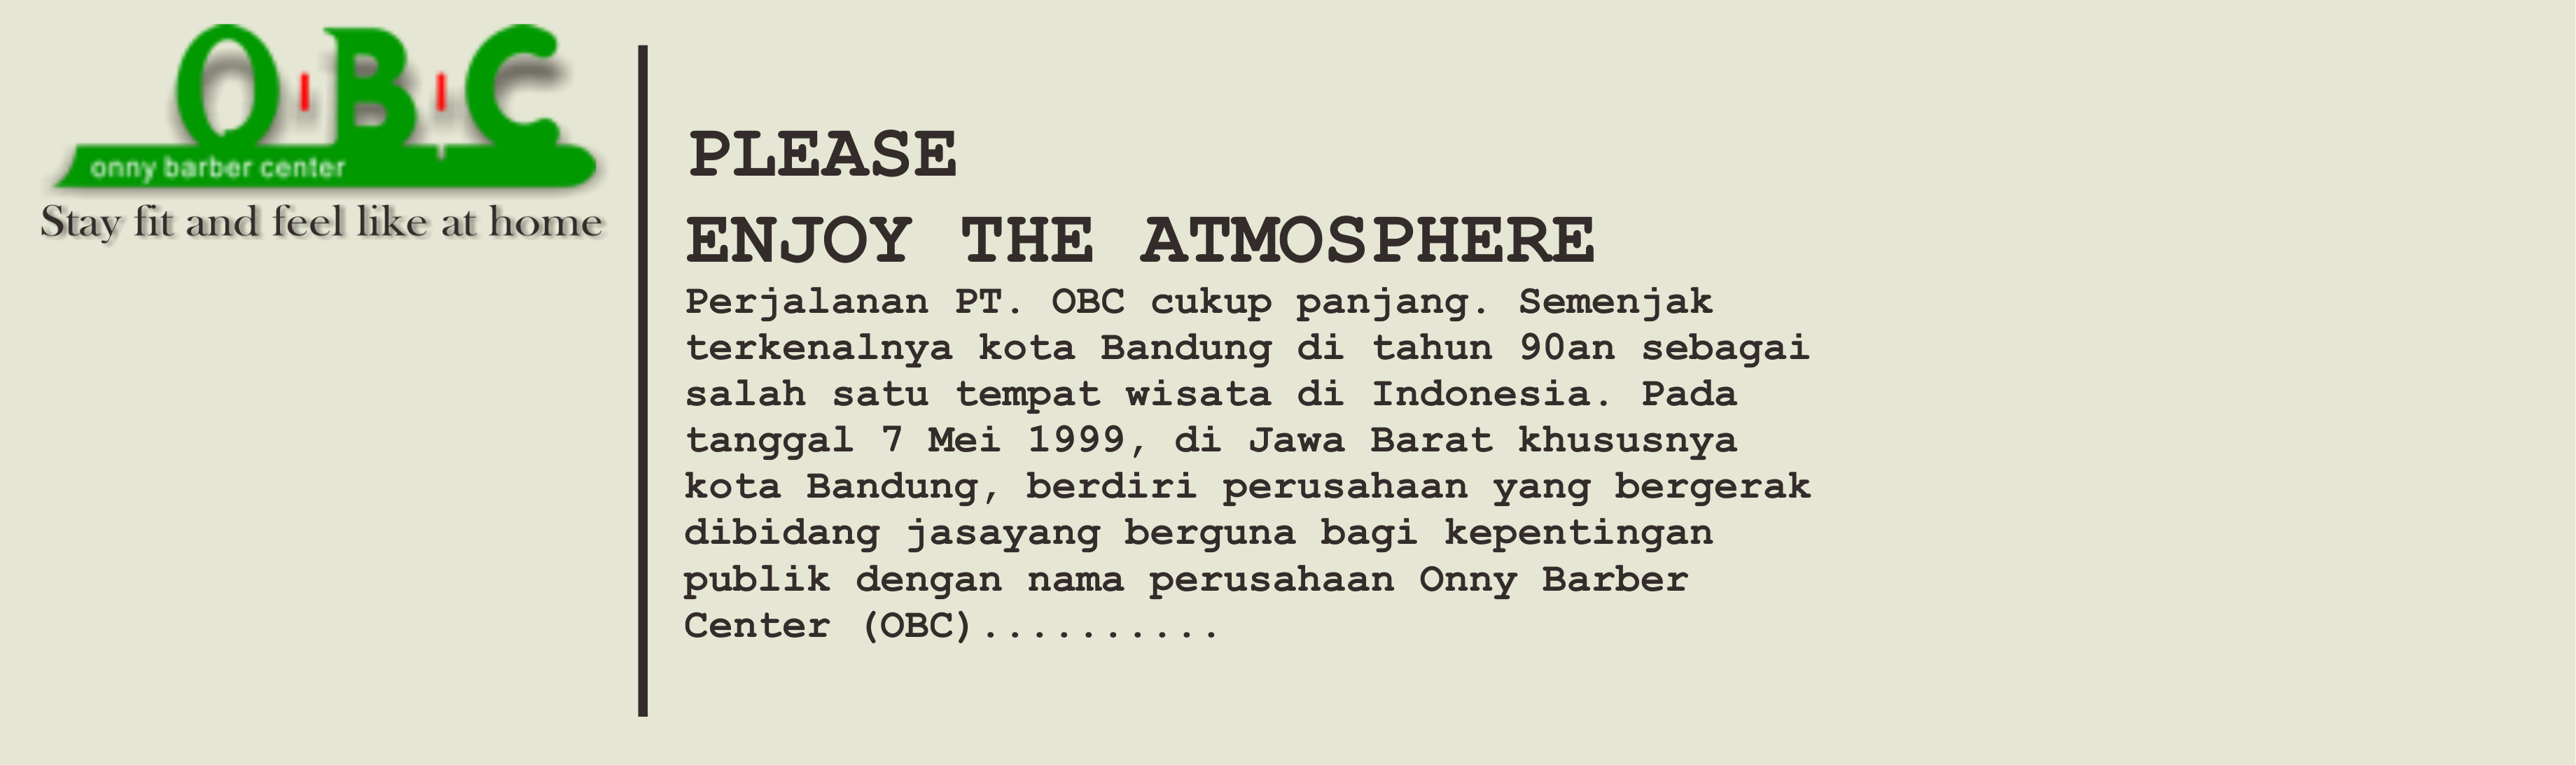 Please Enjoy The Atmosphere